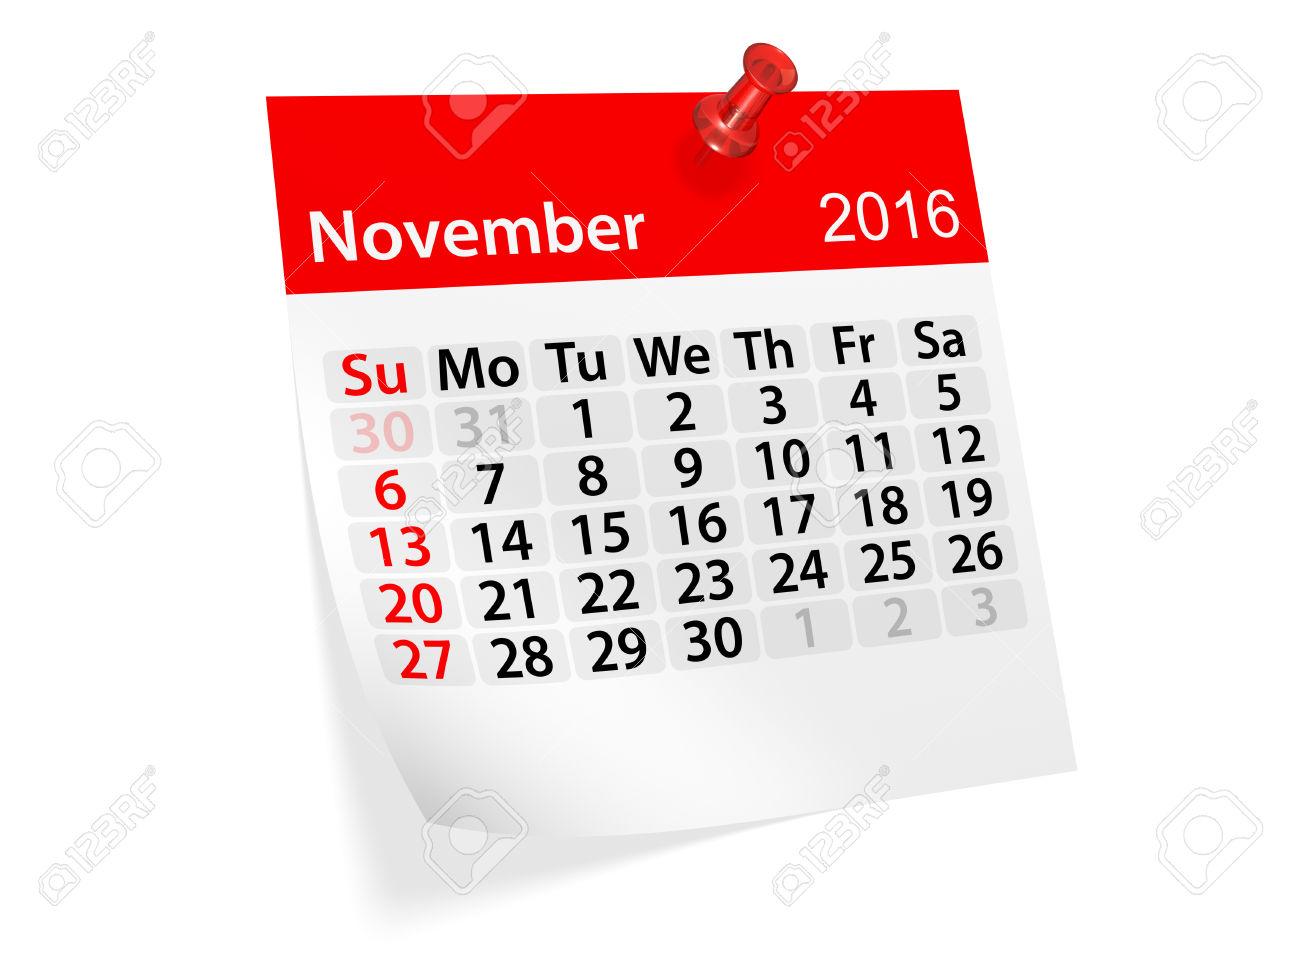 Clipartfest monthly for . Calendar clipart november 2016